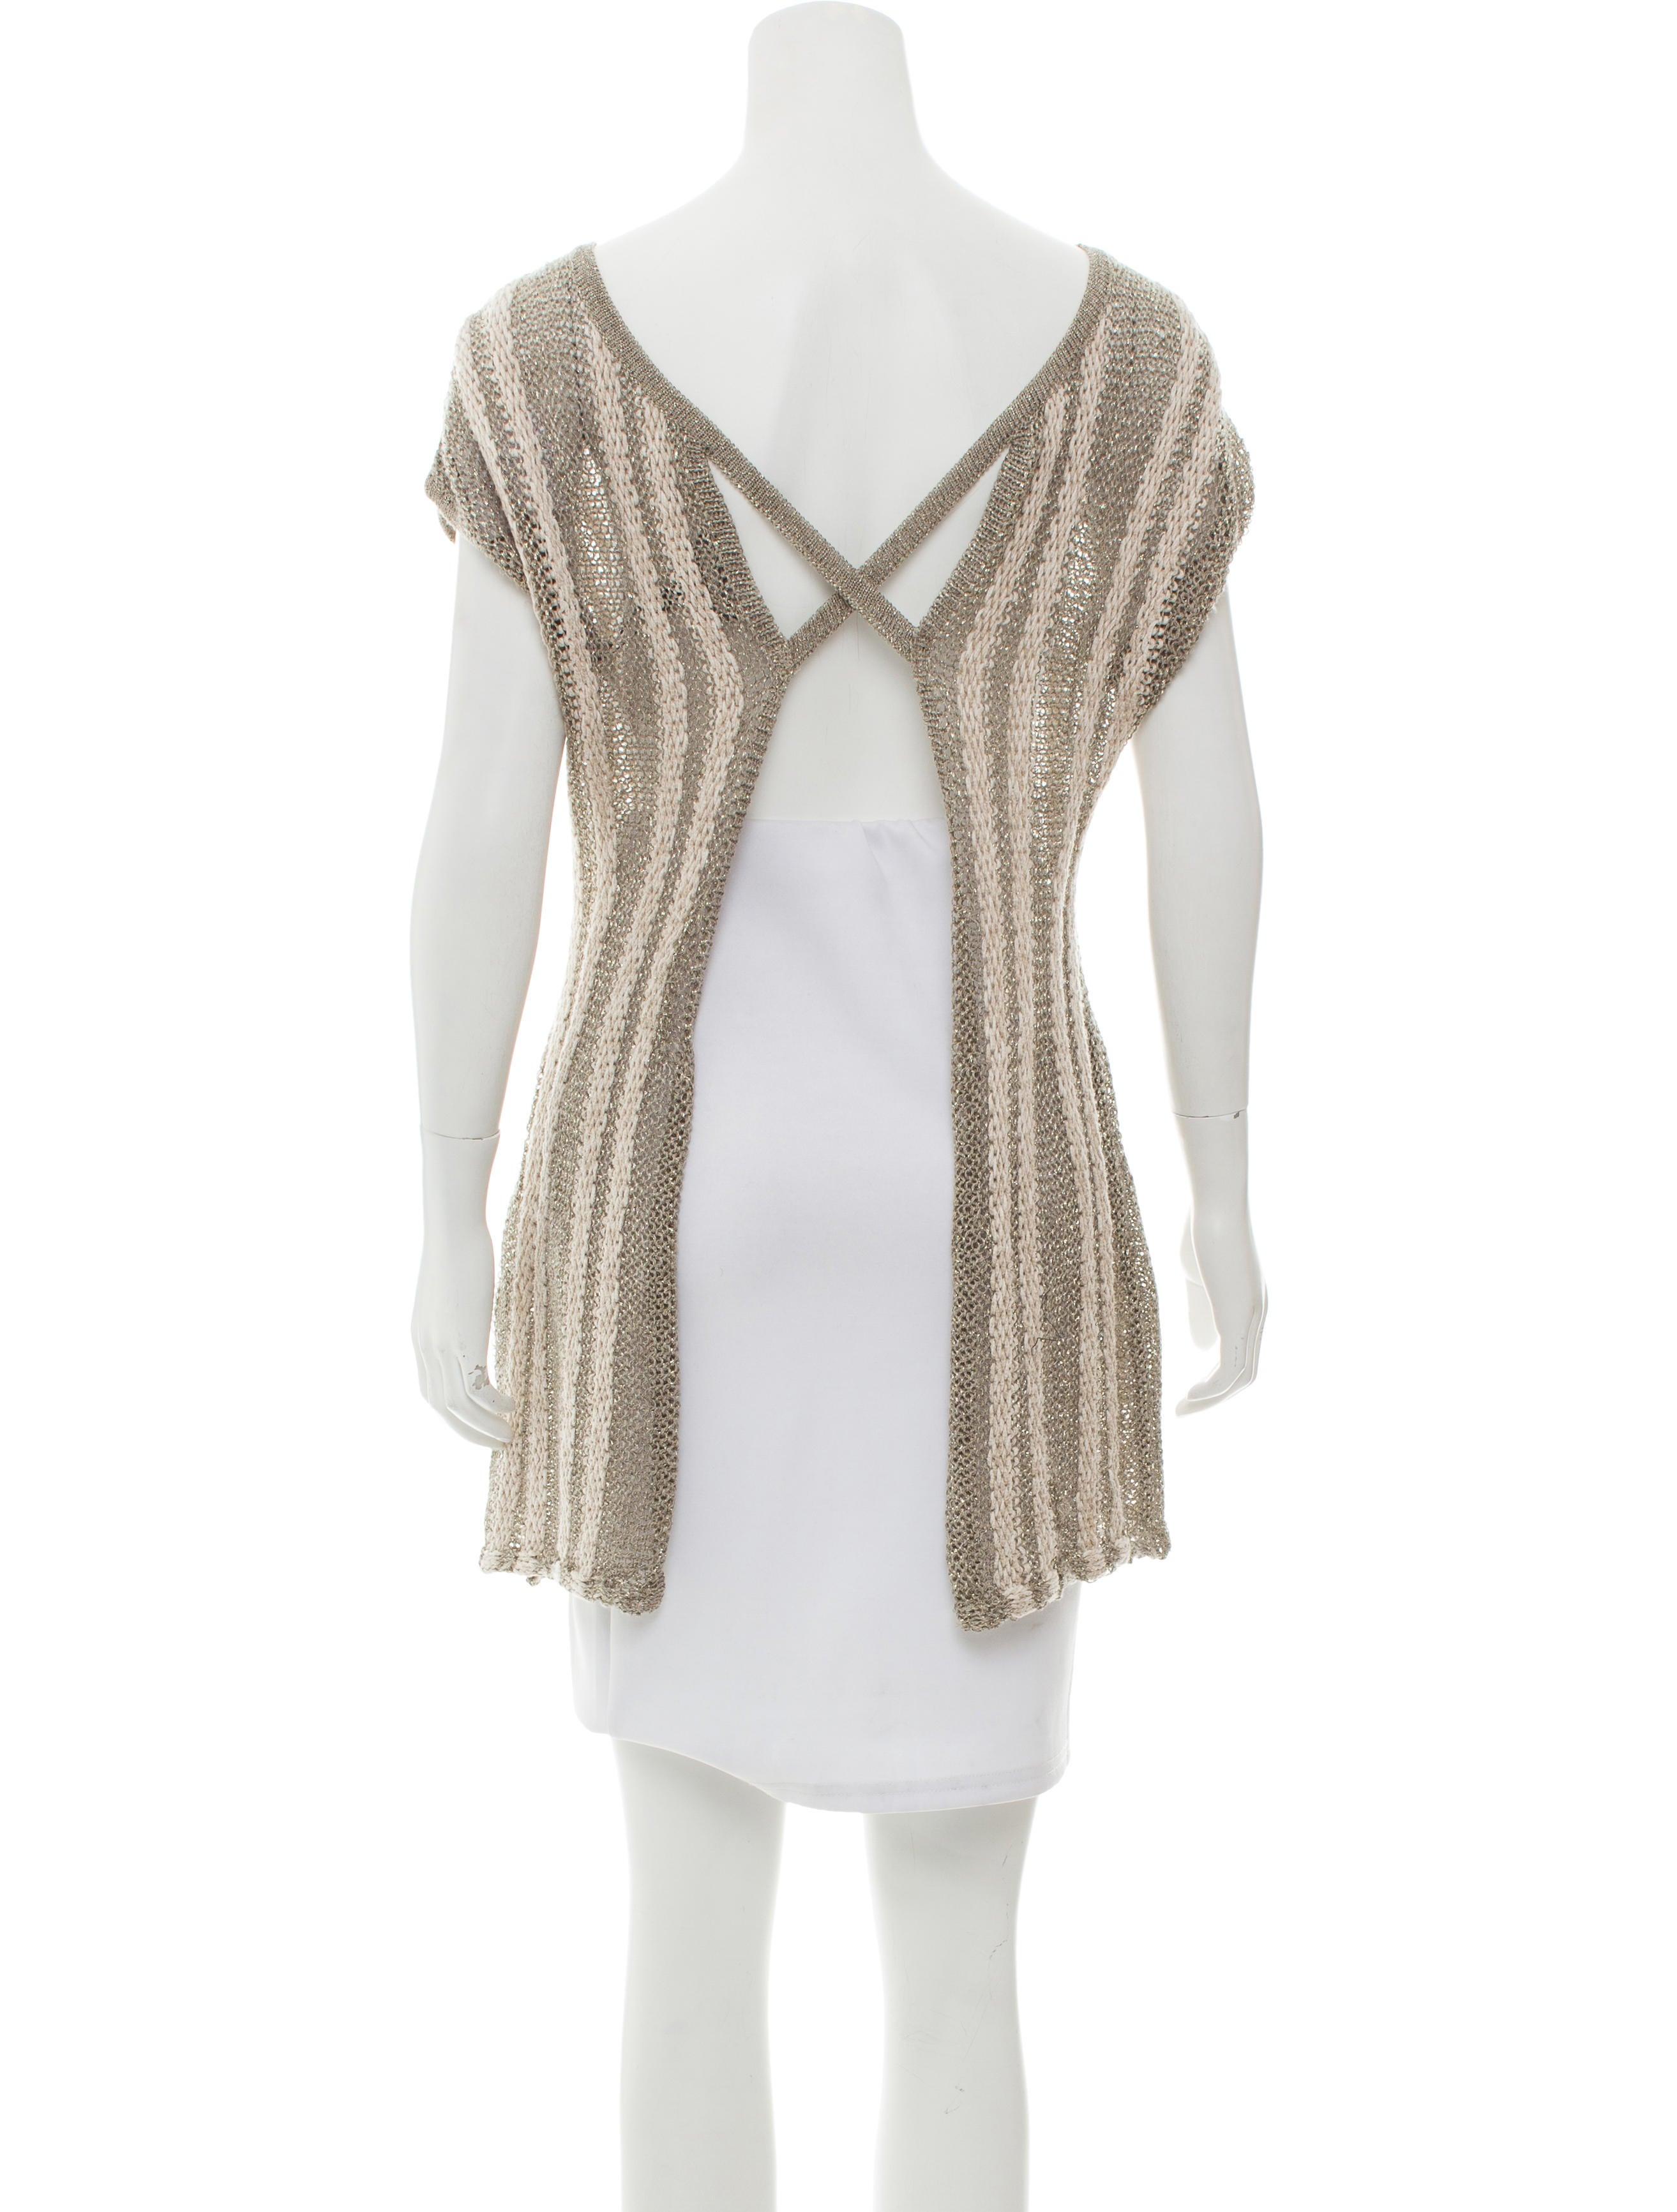 dab538dfea Sarah Pacini Metallic Stripe Knit Tunic - Clothing - WSARP20100 ...